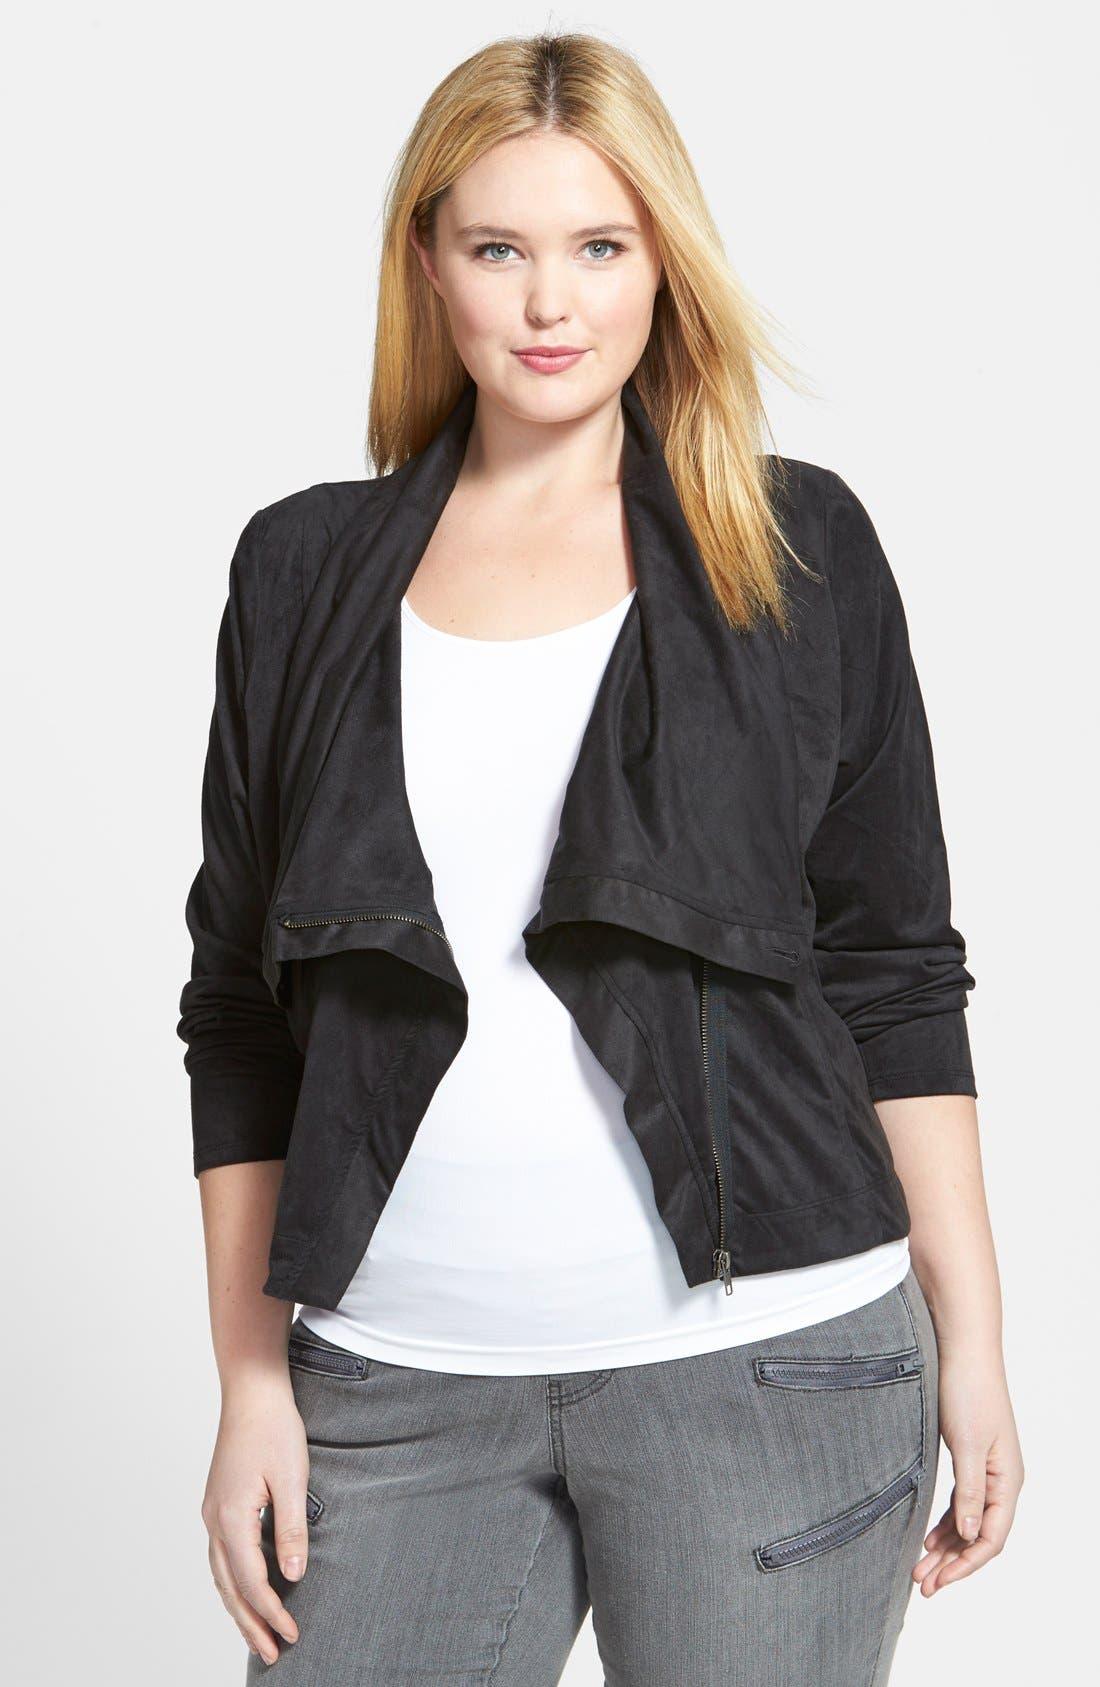 Alternate Image 1 Selected - Jessica Simpson 'Altmar' Faux Suede Asymmetrical Zip Jacket (Plus Size)